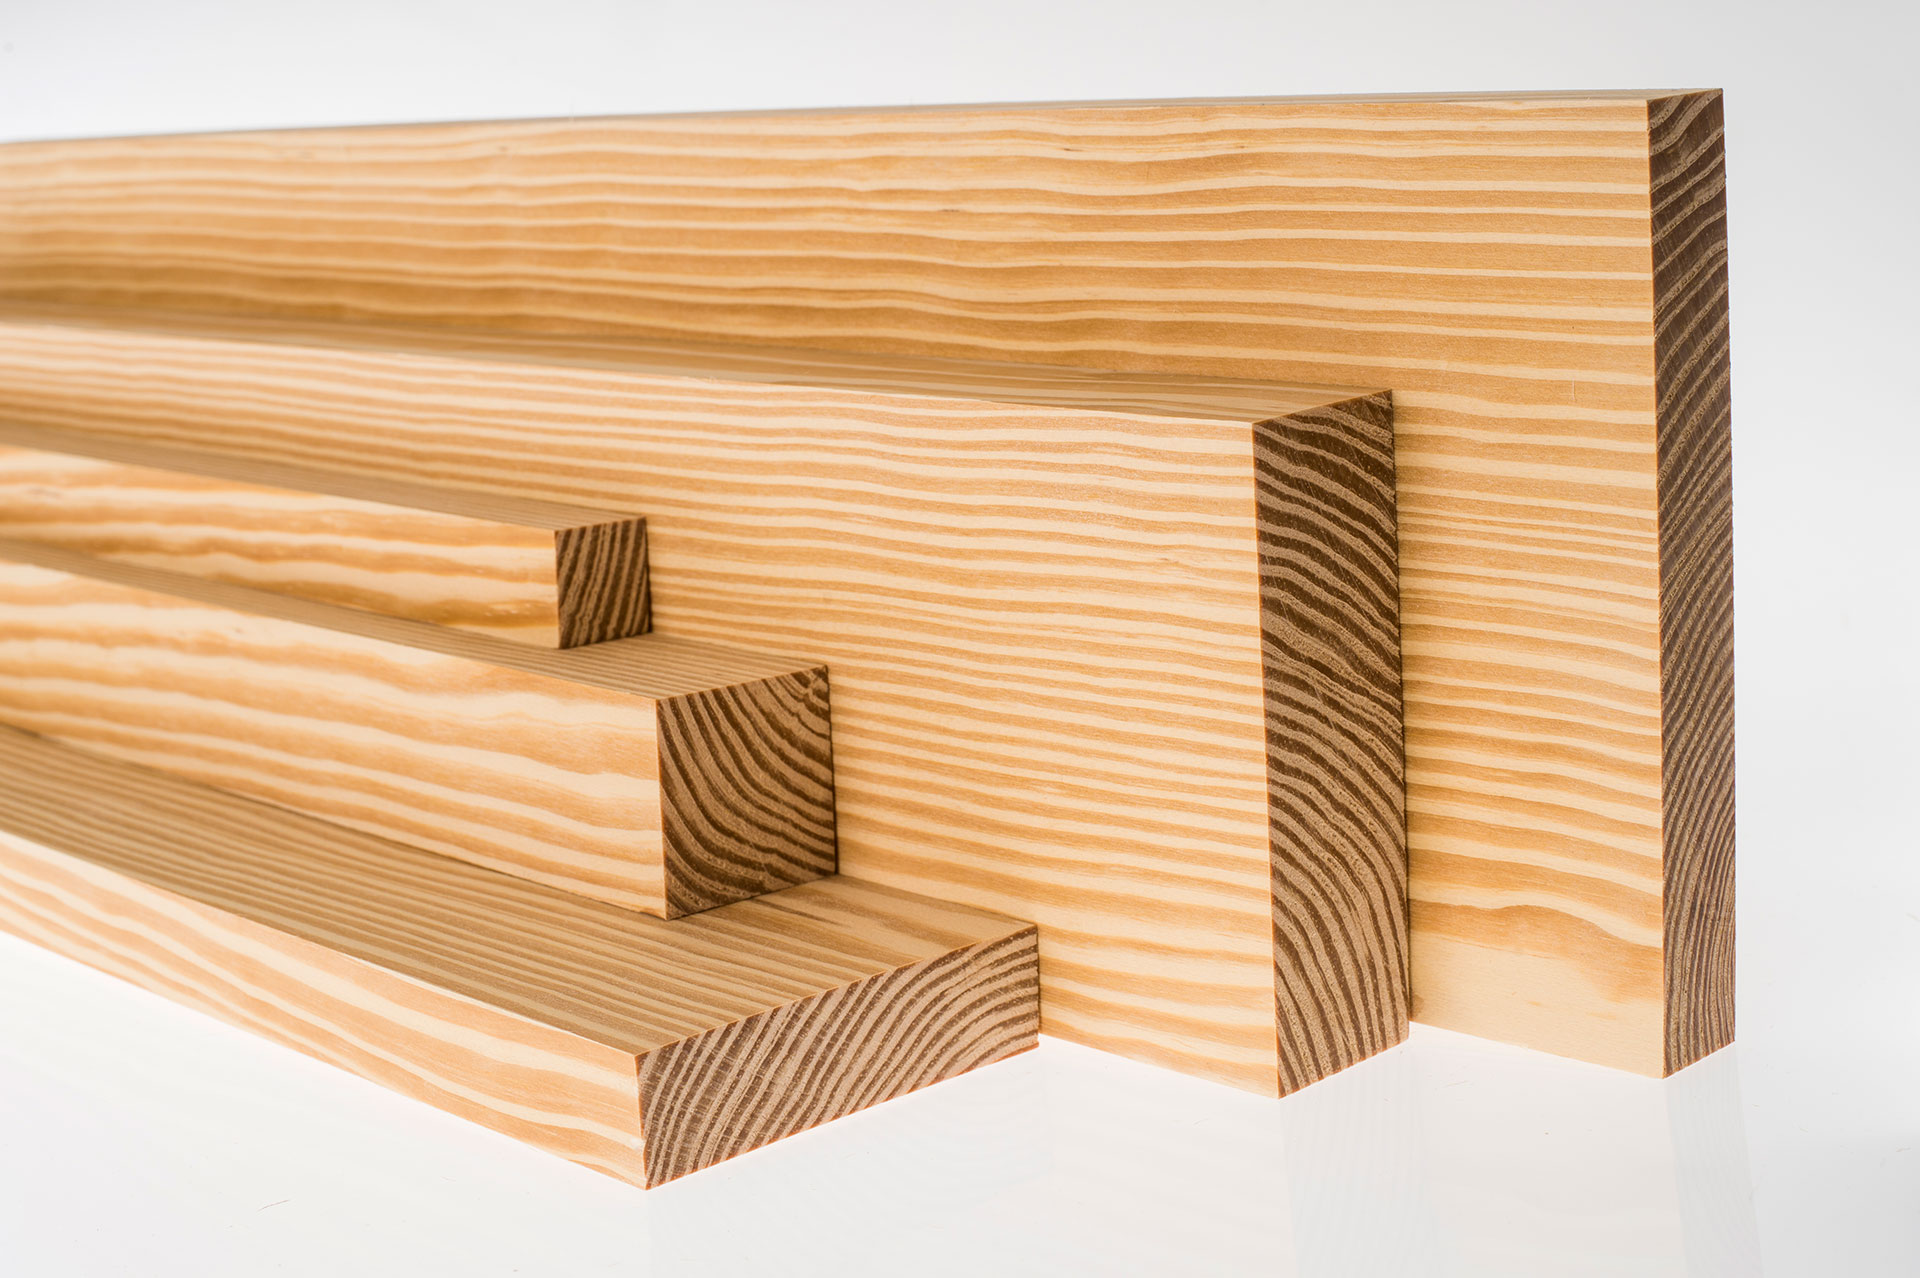 Pine Wood Lumber ~ Southern yellow pine wood cut to order